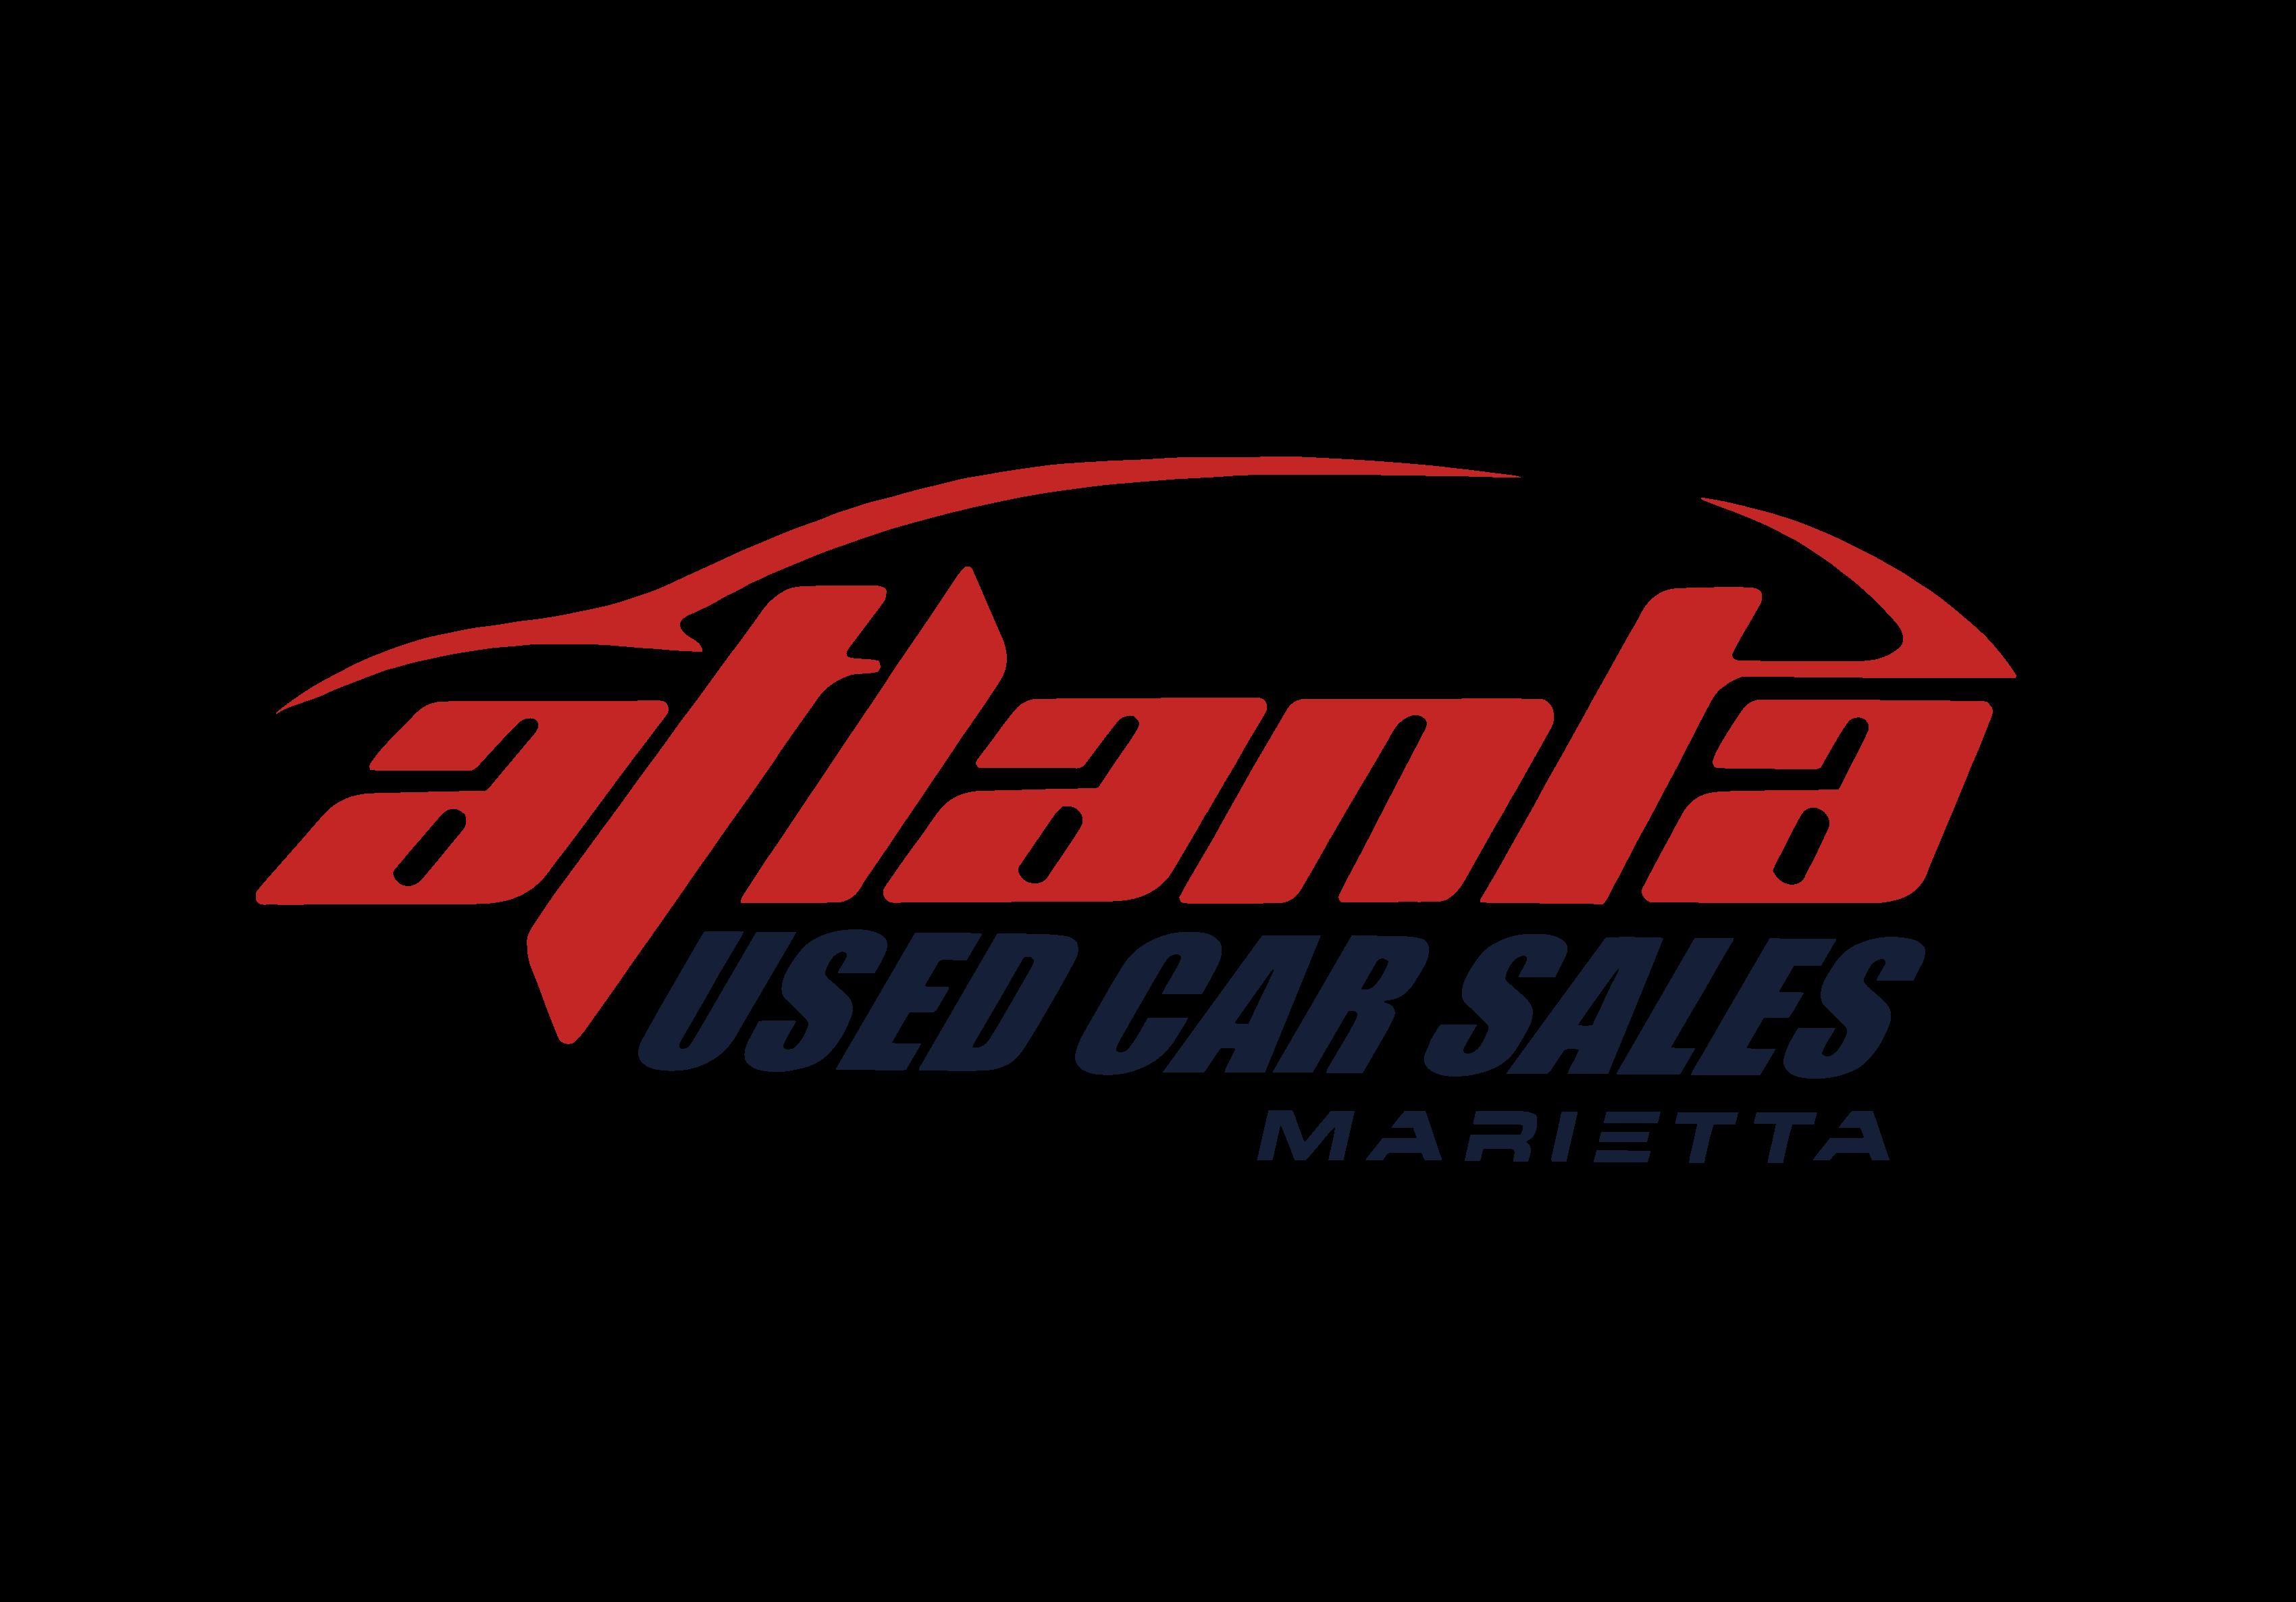 Atlanta Used Car Sales Marietta Logo